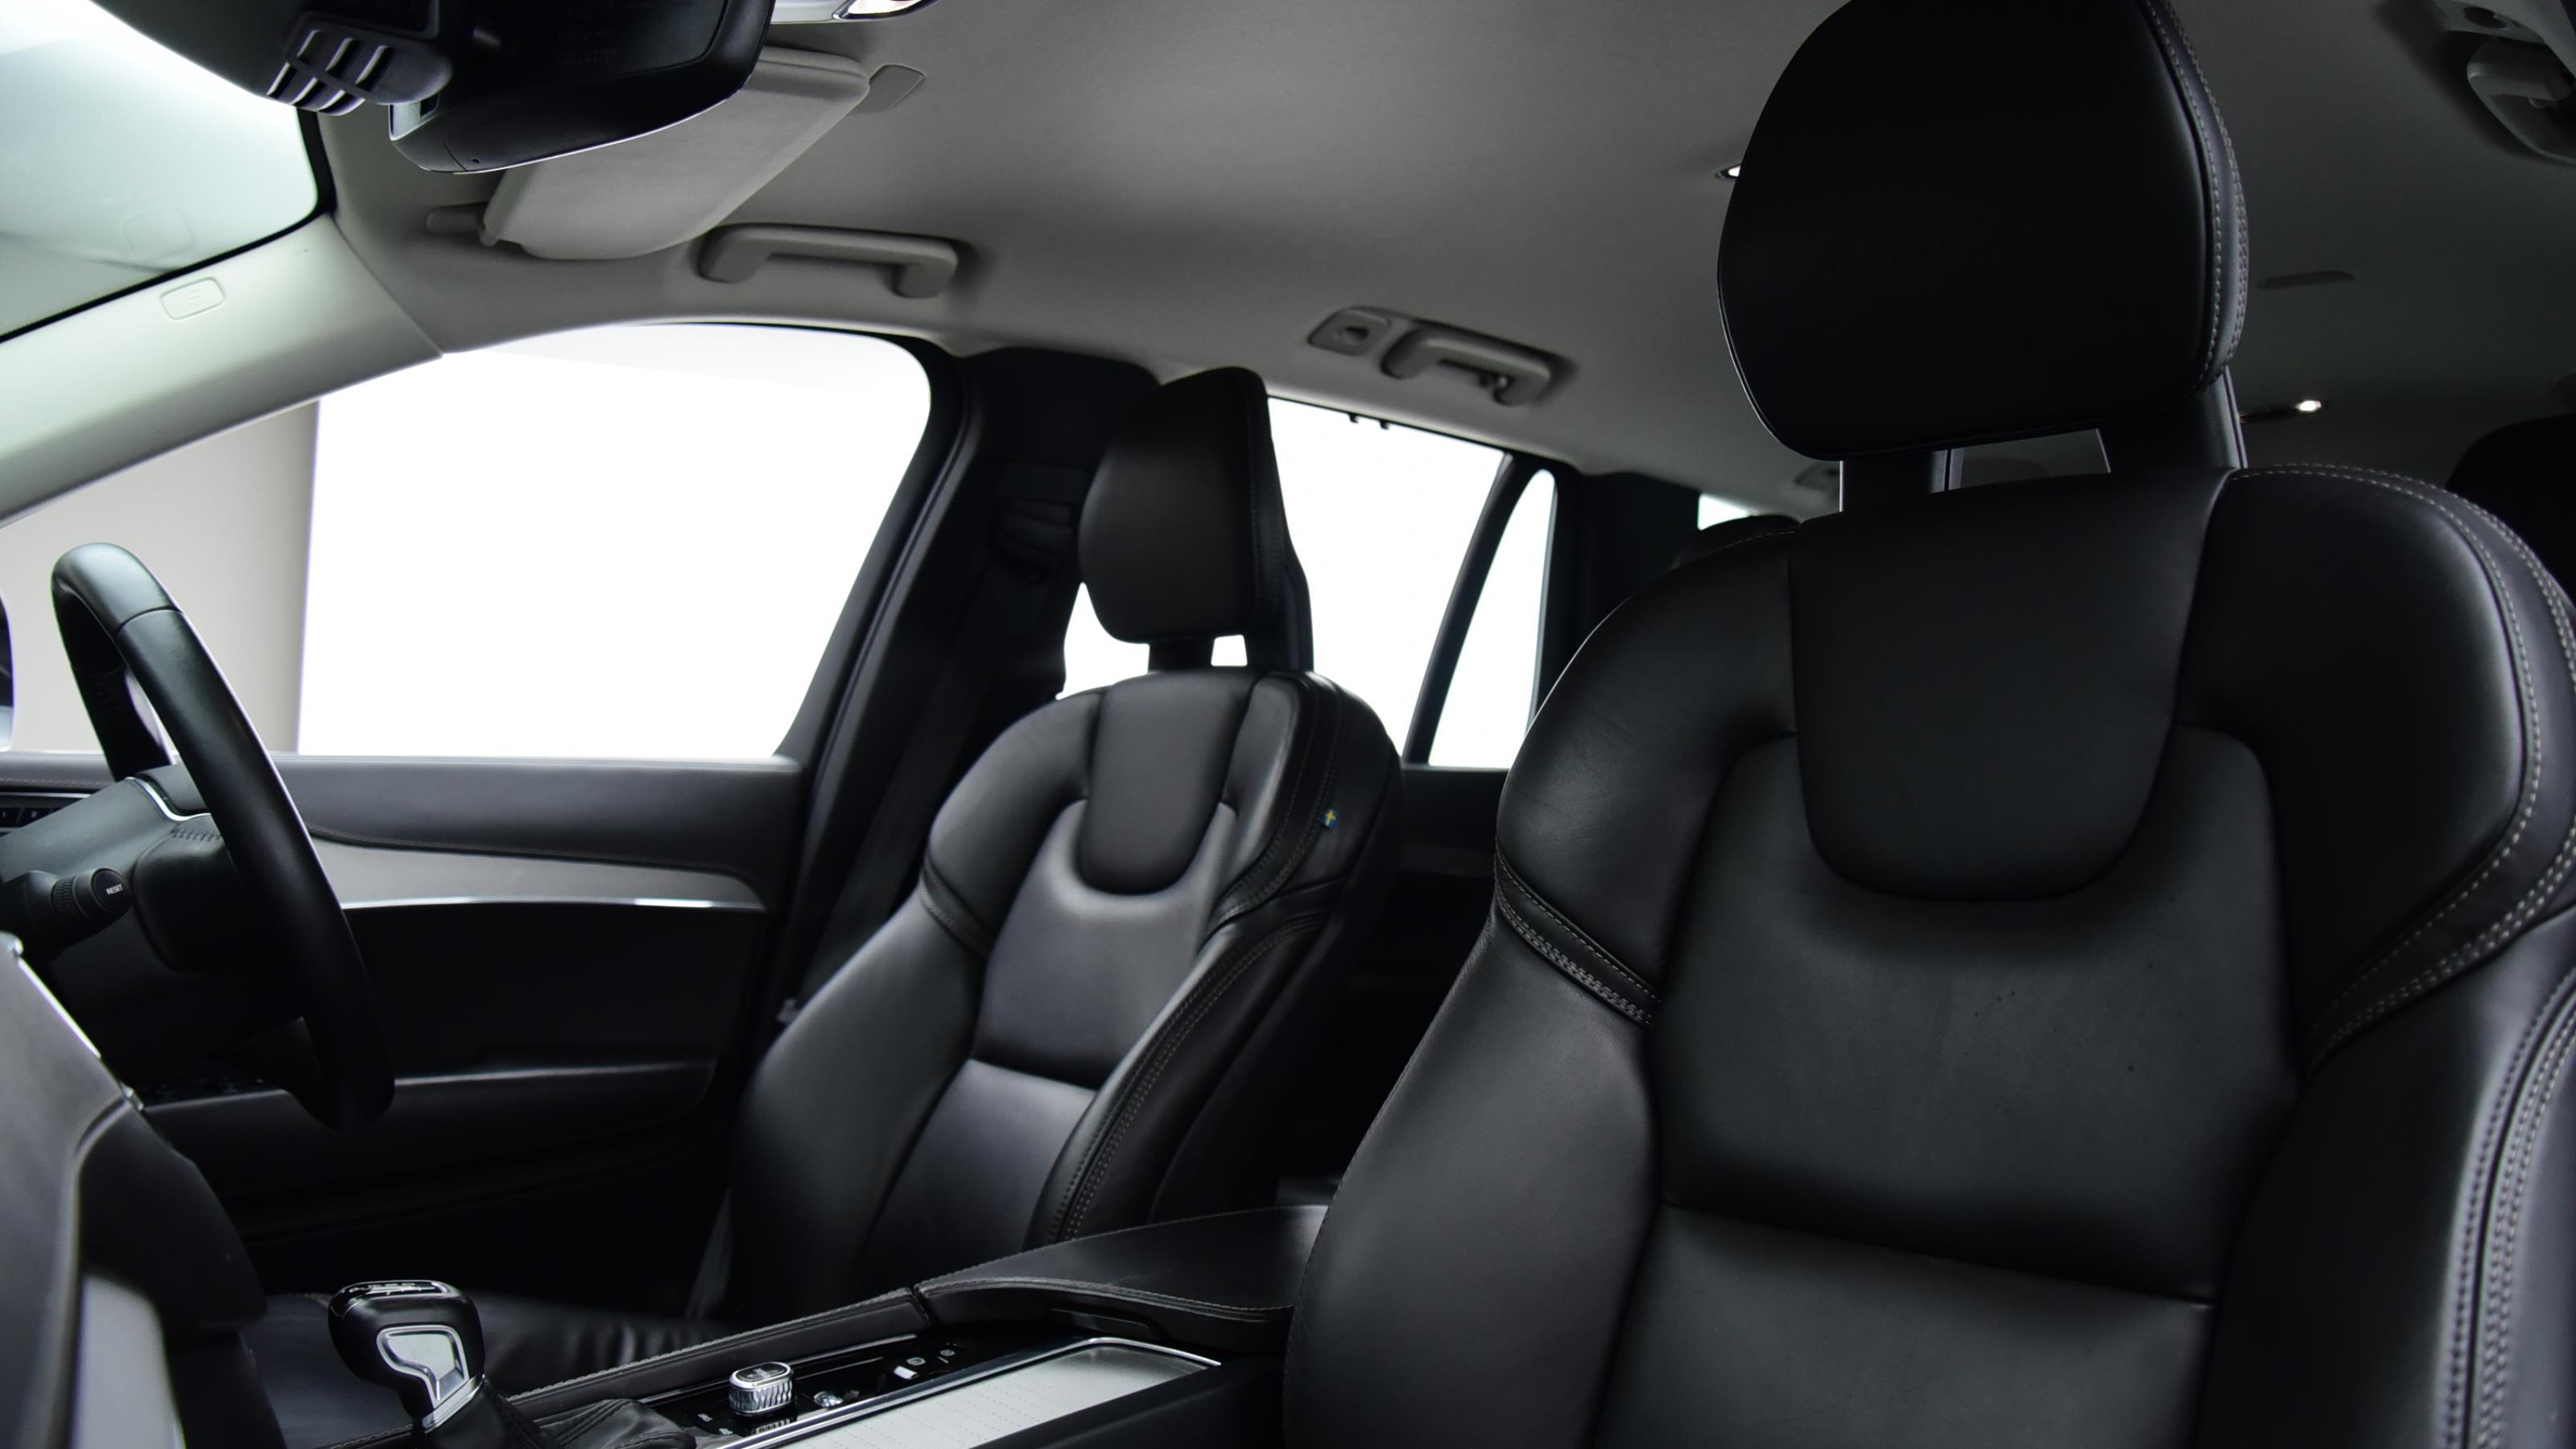 Used 2017 Volvo XC90 2.0 D5 PowerPulse Inscription 5dr AWD Geartronic GREY at Saxton4x4